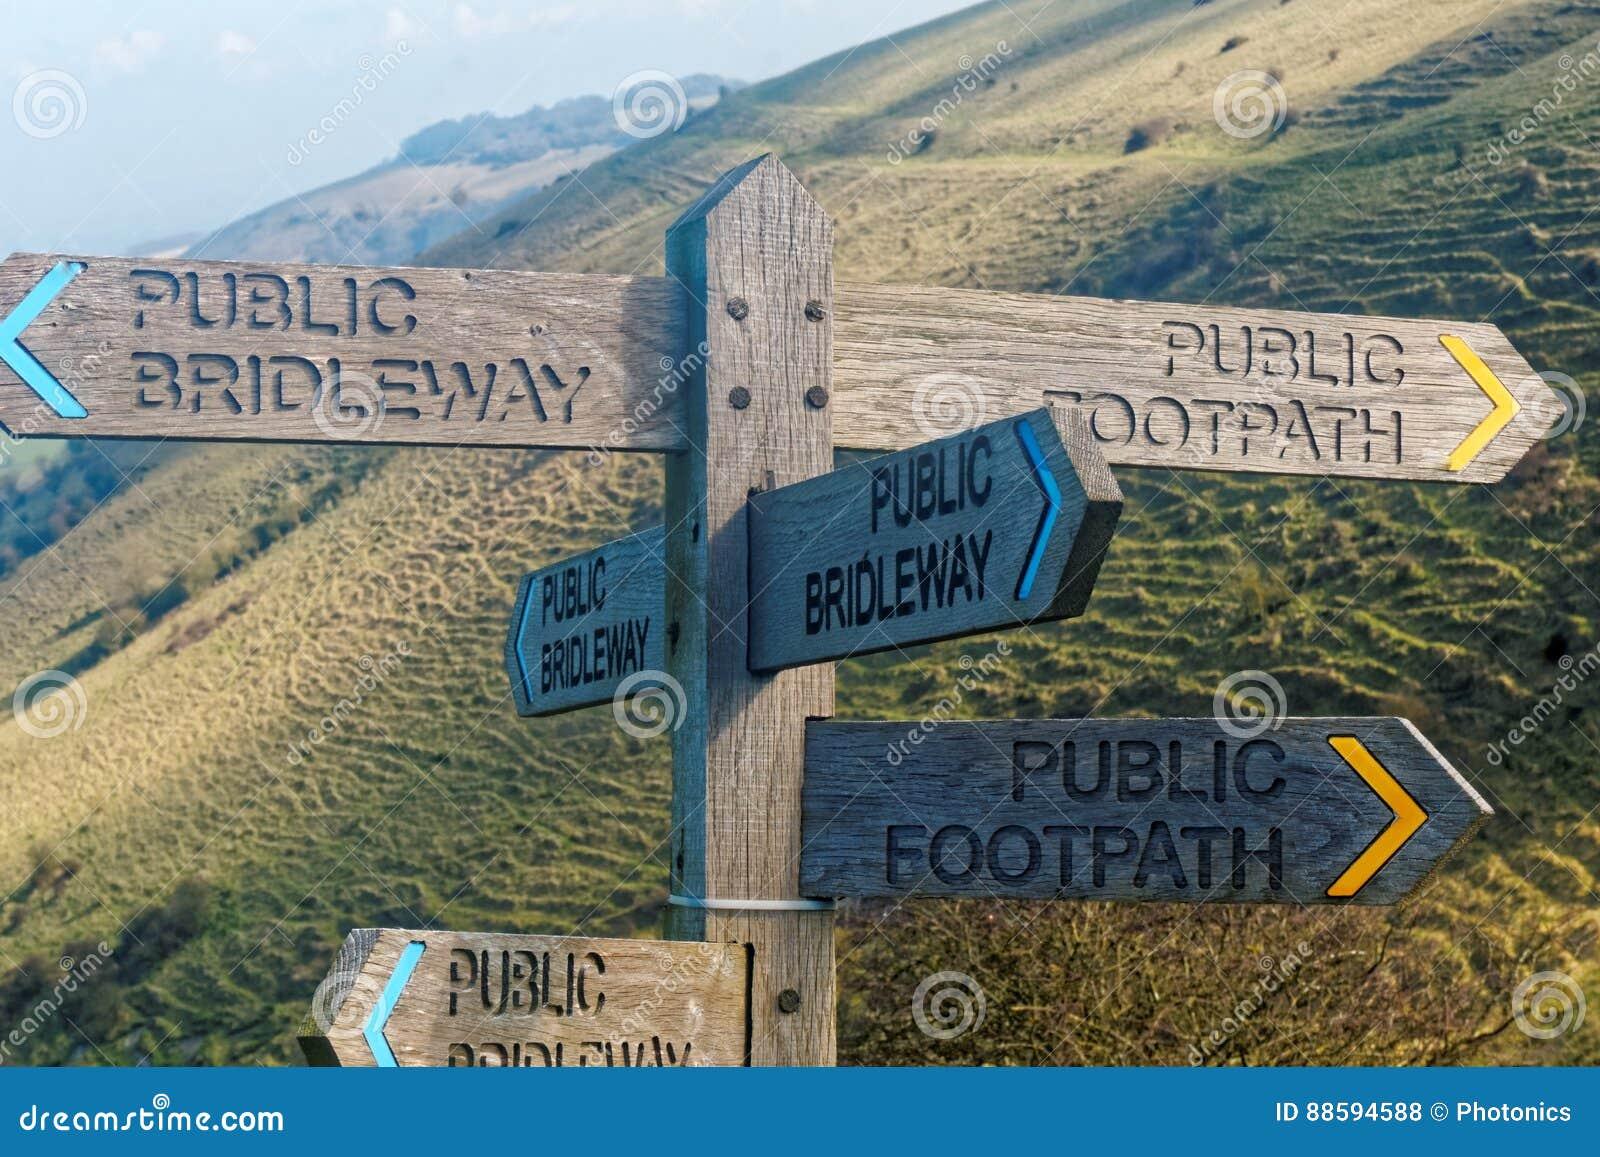 Choice of Paths